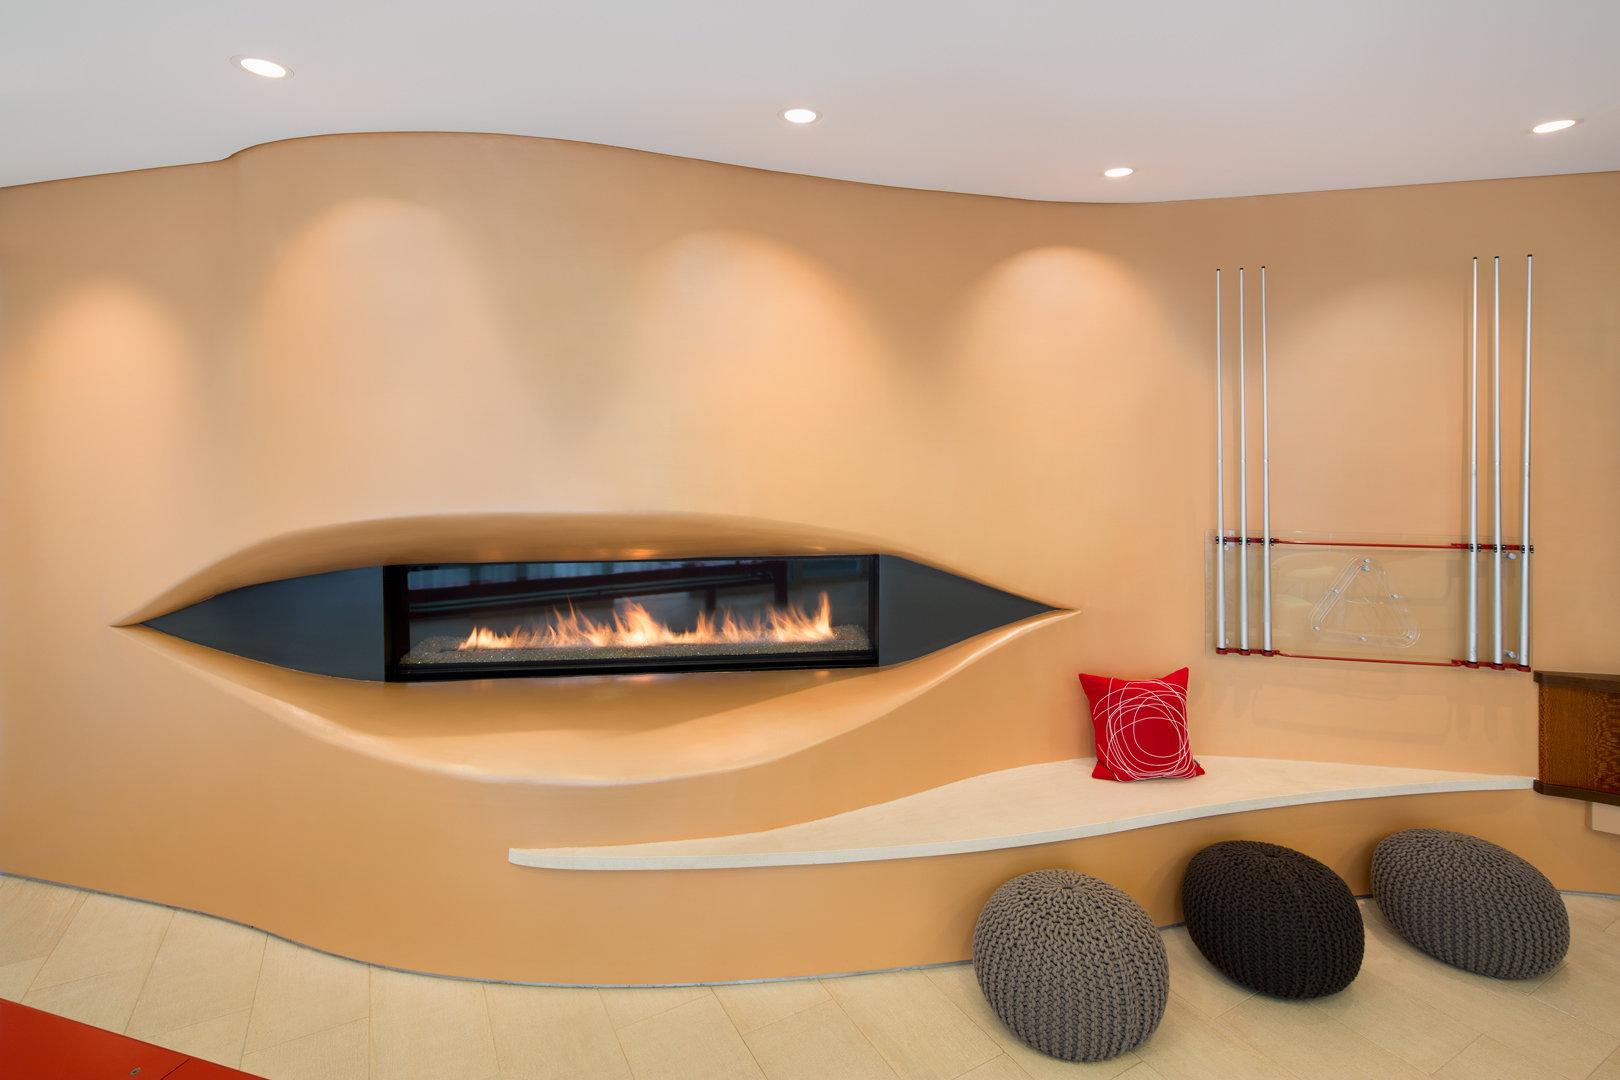 Lena_Crescentini_Fireplace_WEB.jpg